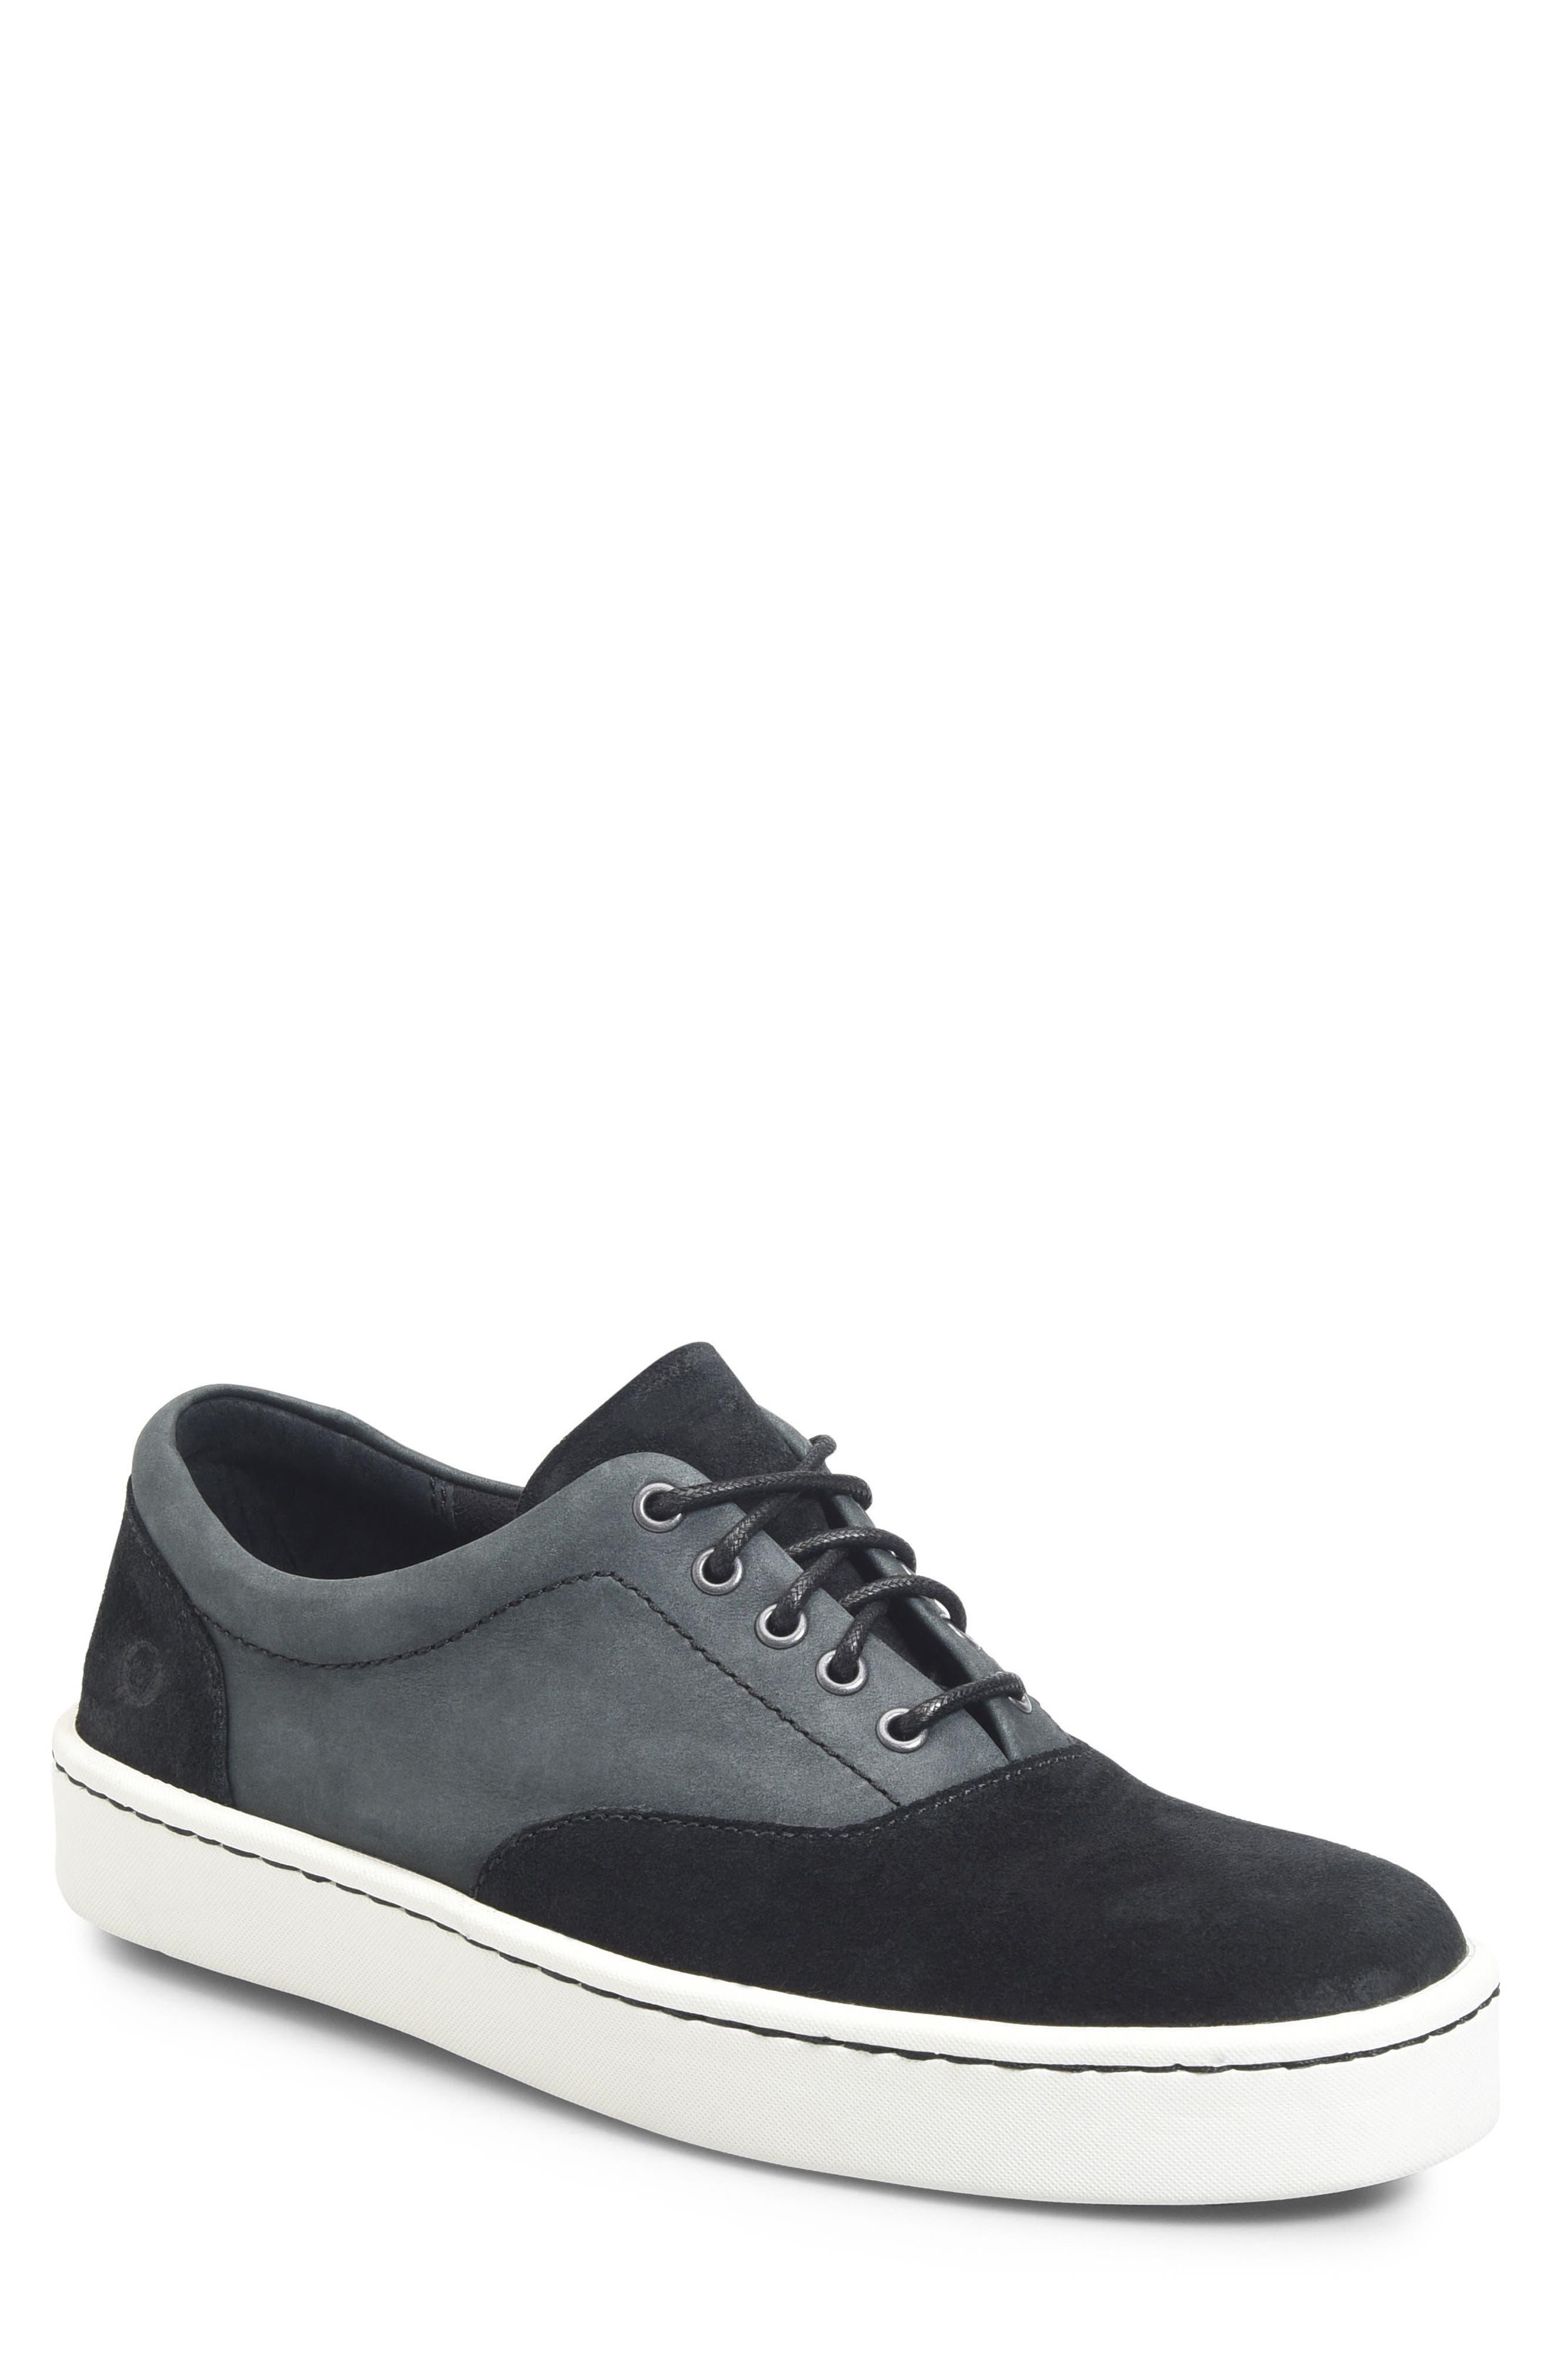 Keystone Low Top Sneaker,                             Main thumbnail 1, color,                             001